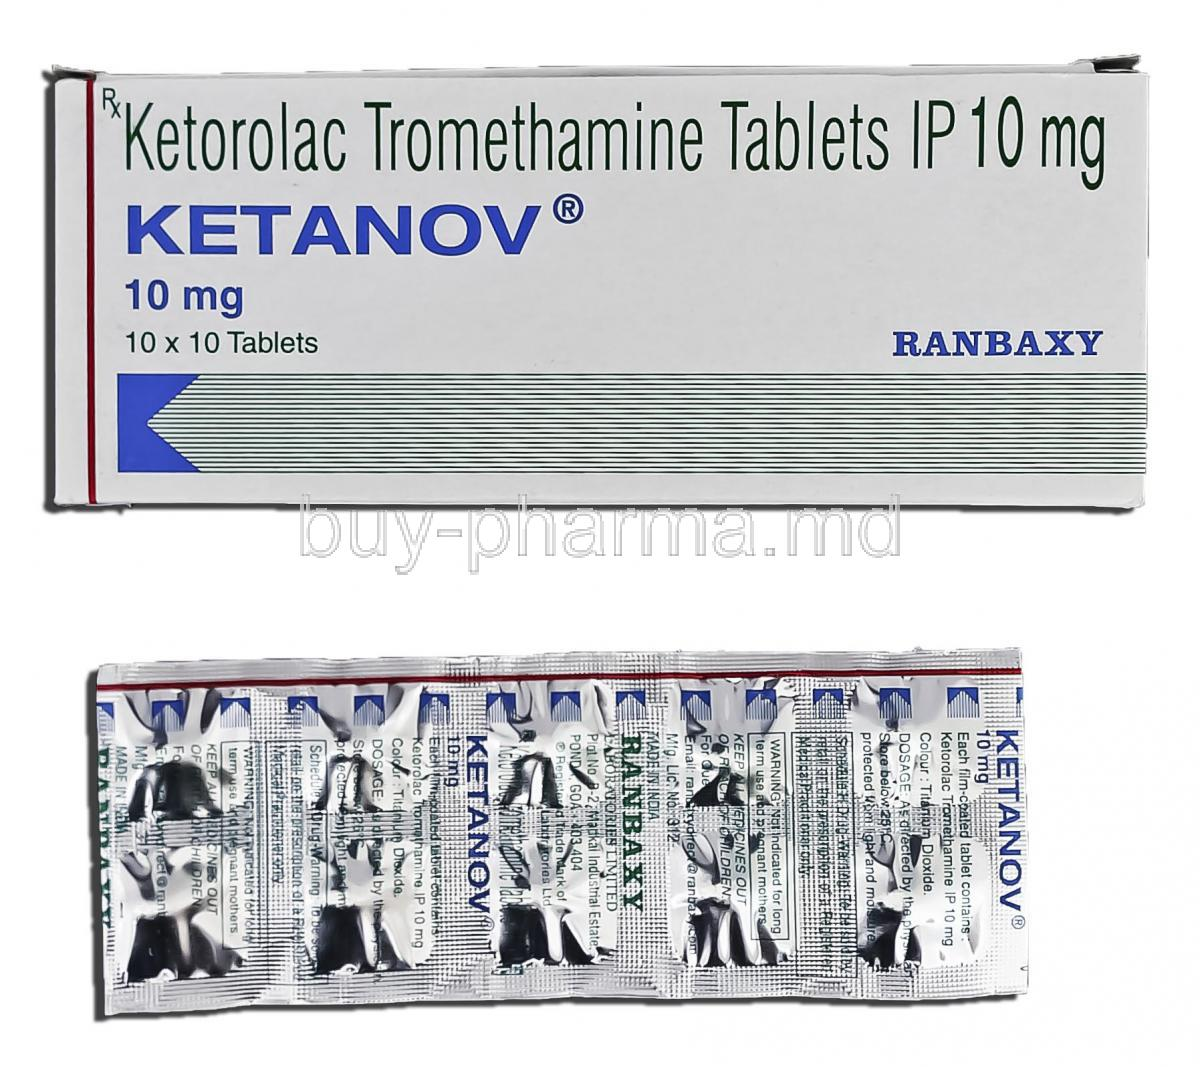 Ketorol tabletleri